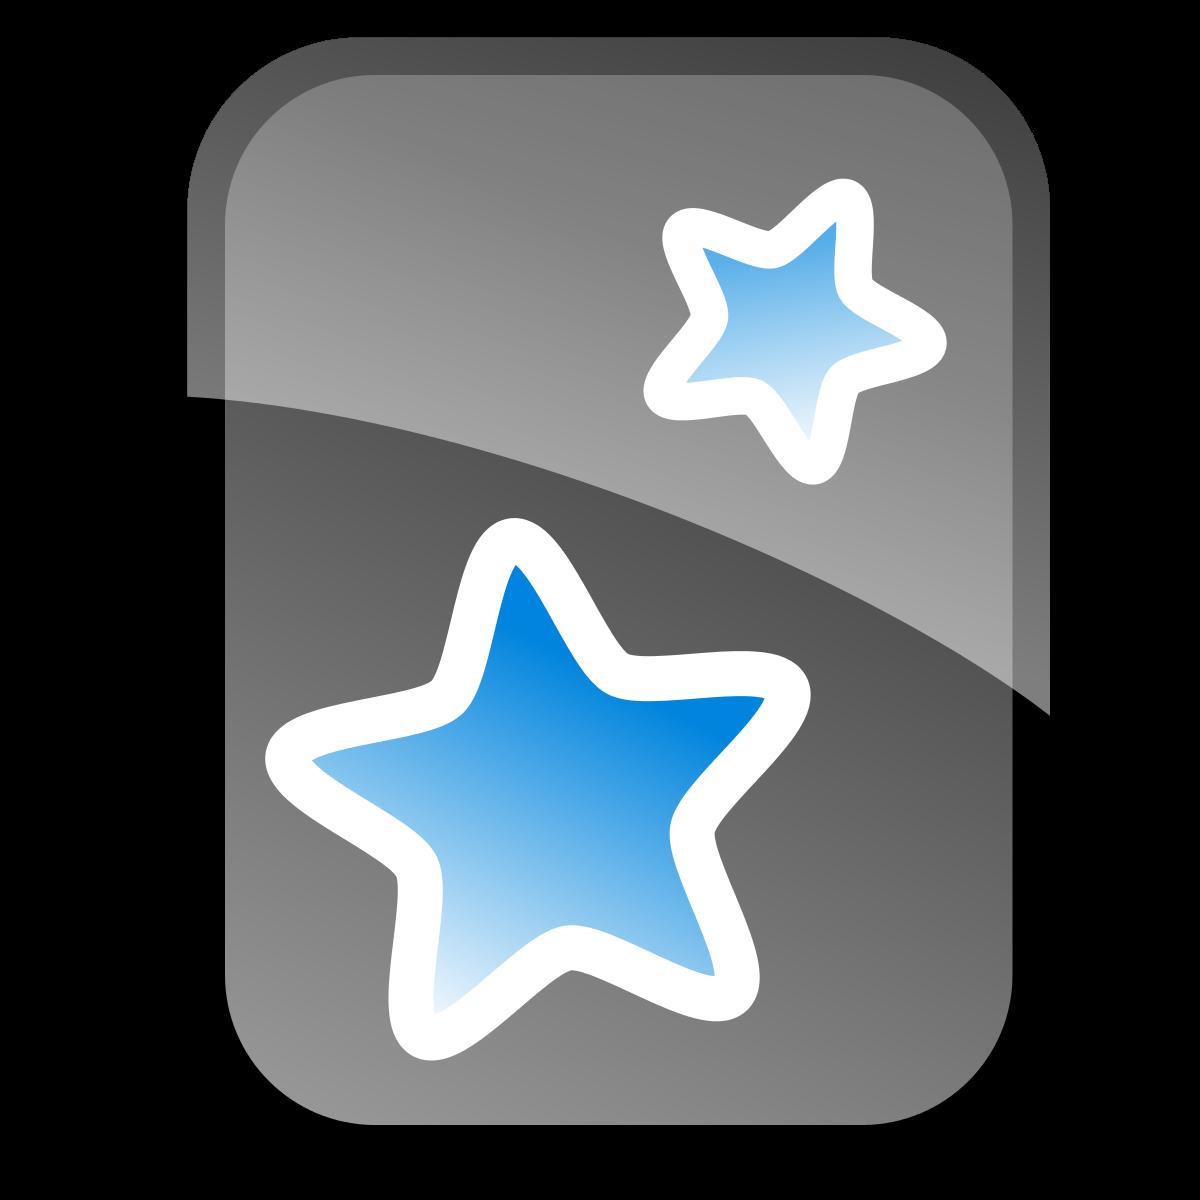 Anki ikona